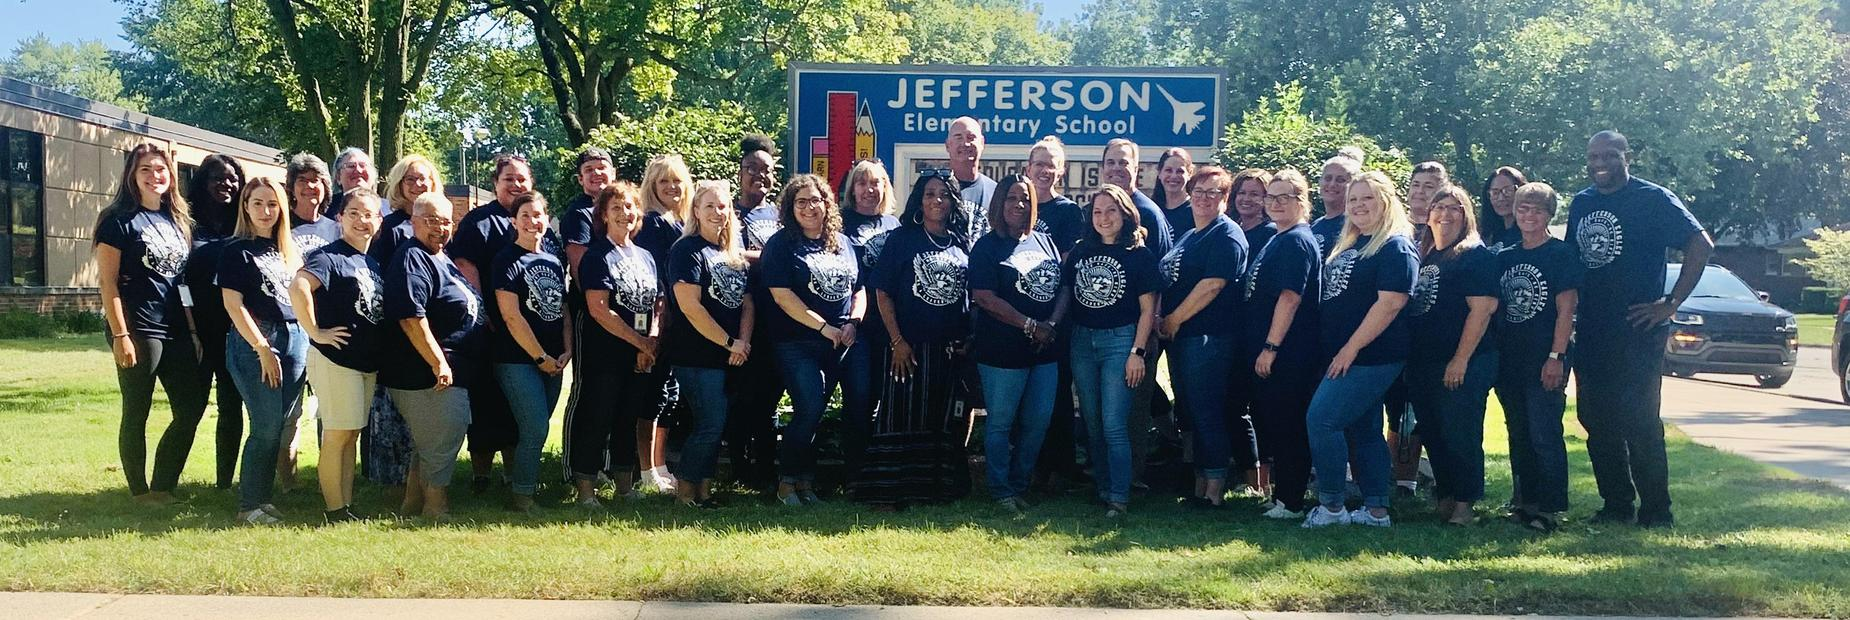 Jefferson Staff in front of the Jefferson Elementary School sign.